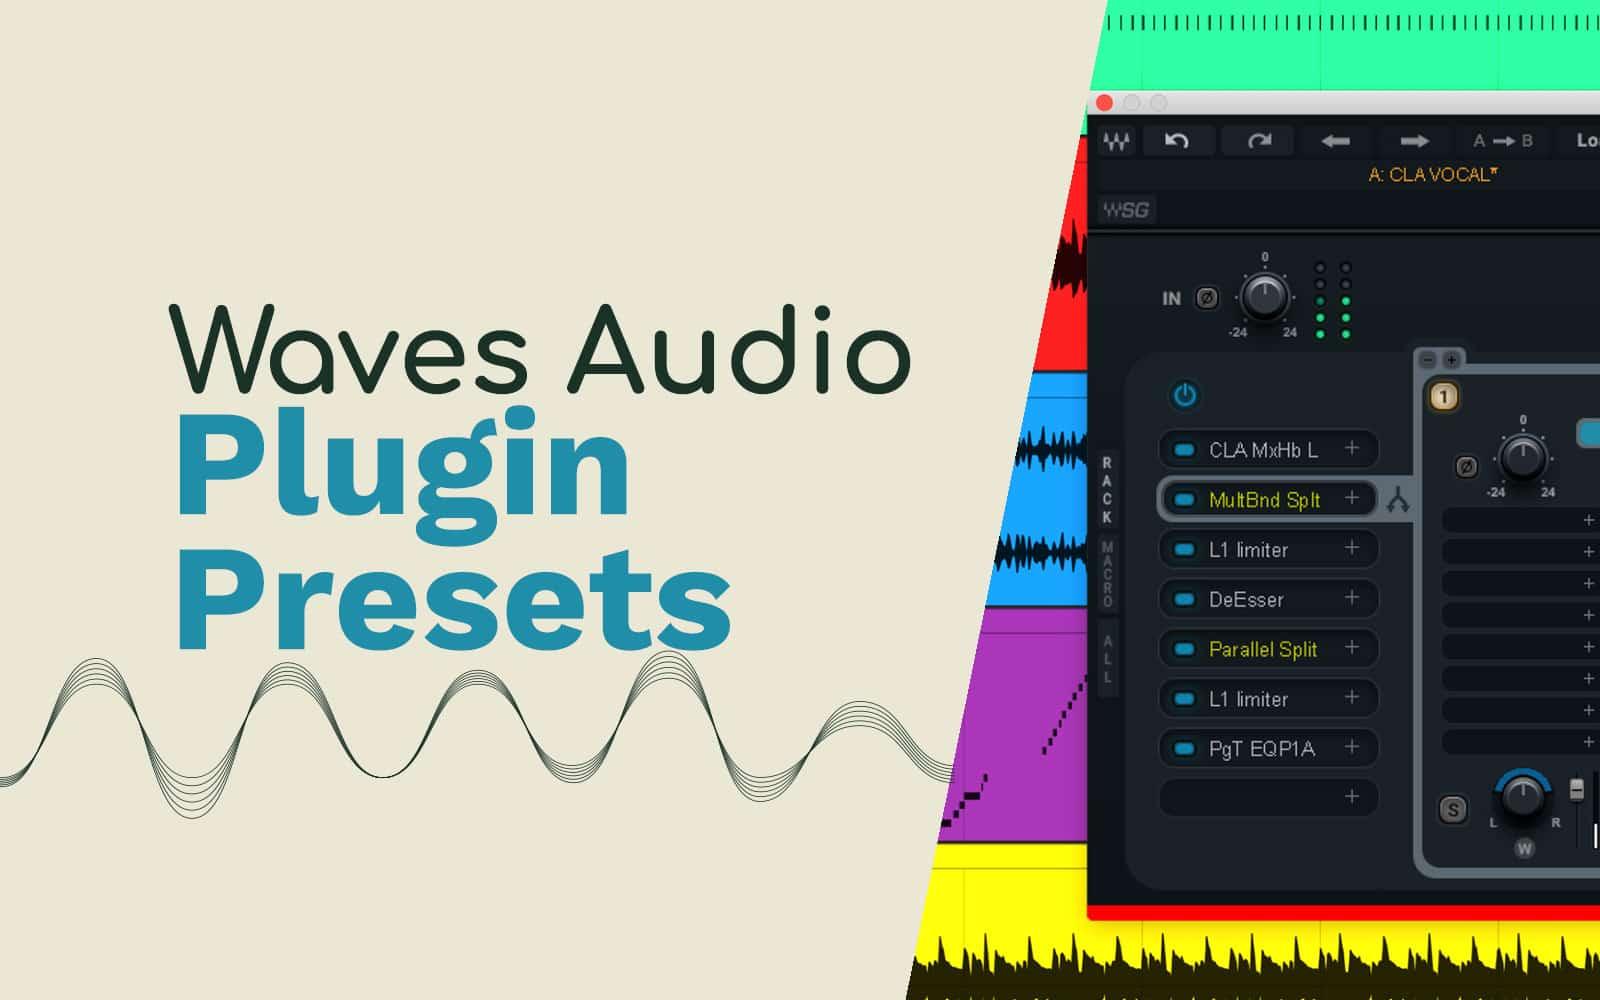 waves audio plugin presets